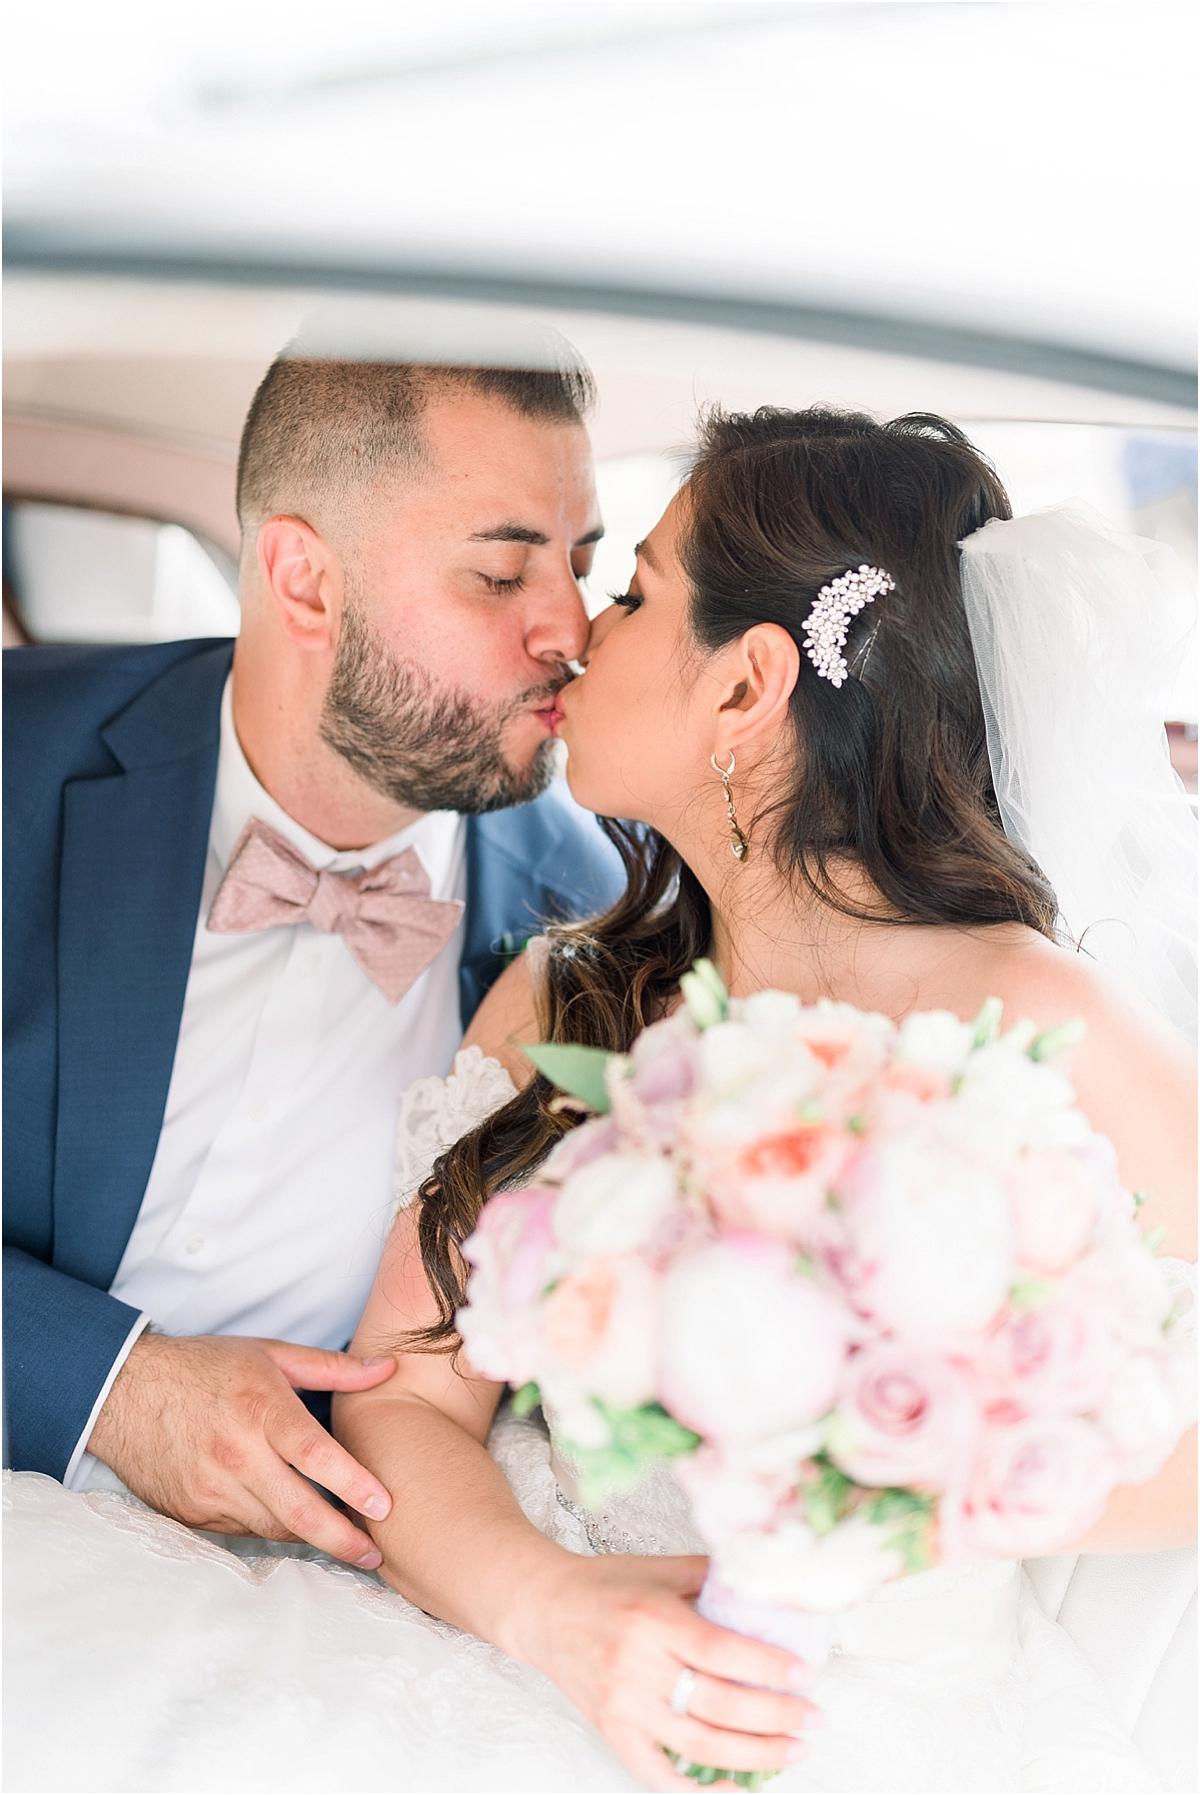 Rancho Los Guzman Wedding Joliet, Joliet Wedding, Joliet Wedding Photographer, Chicago Wedding Photographer, Best Photographer In Joliet, Best Photographer In Chicago, Light And Airy Photographer Chicago_0038.jpg